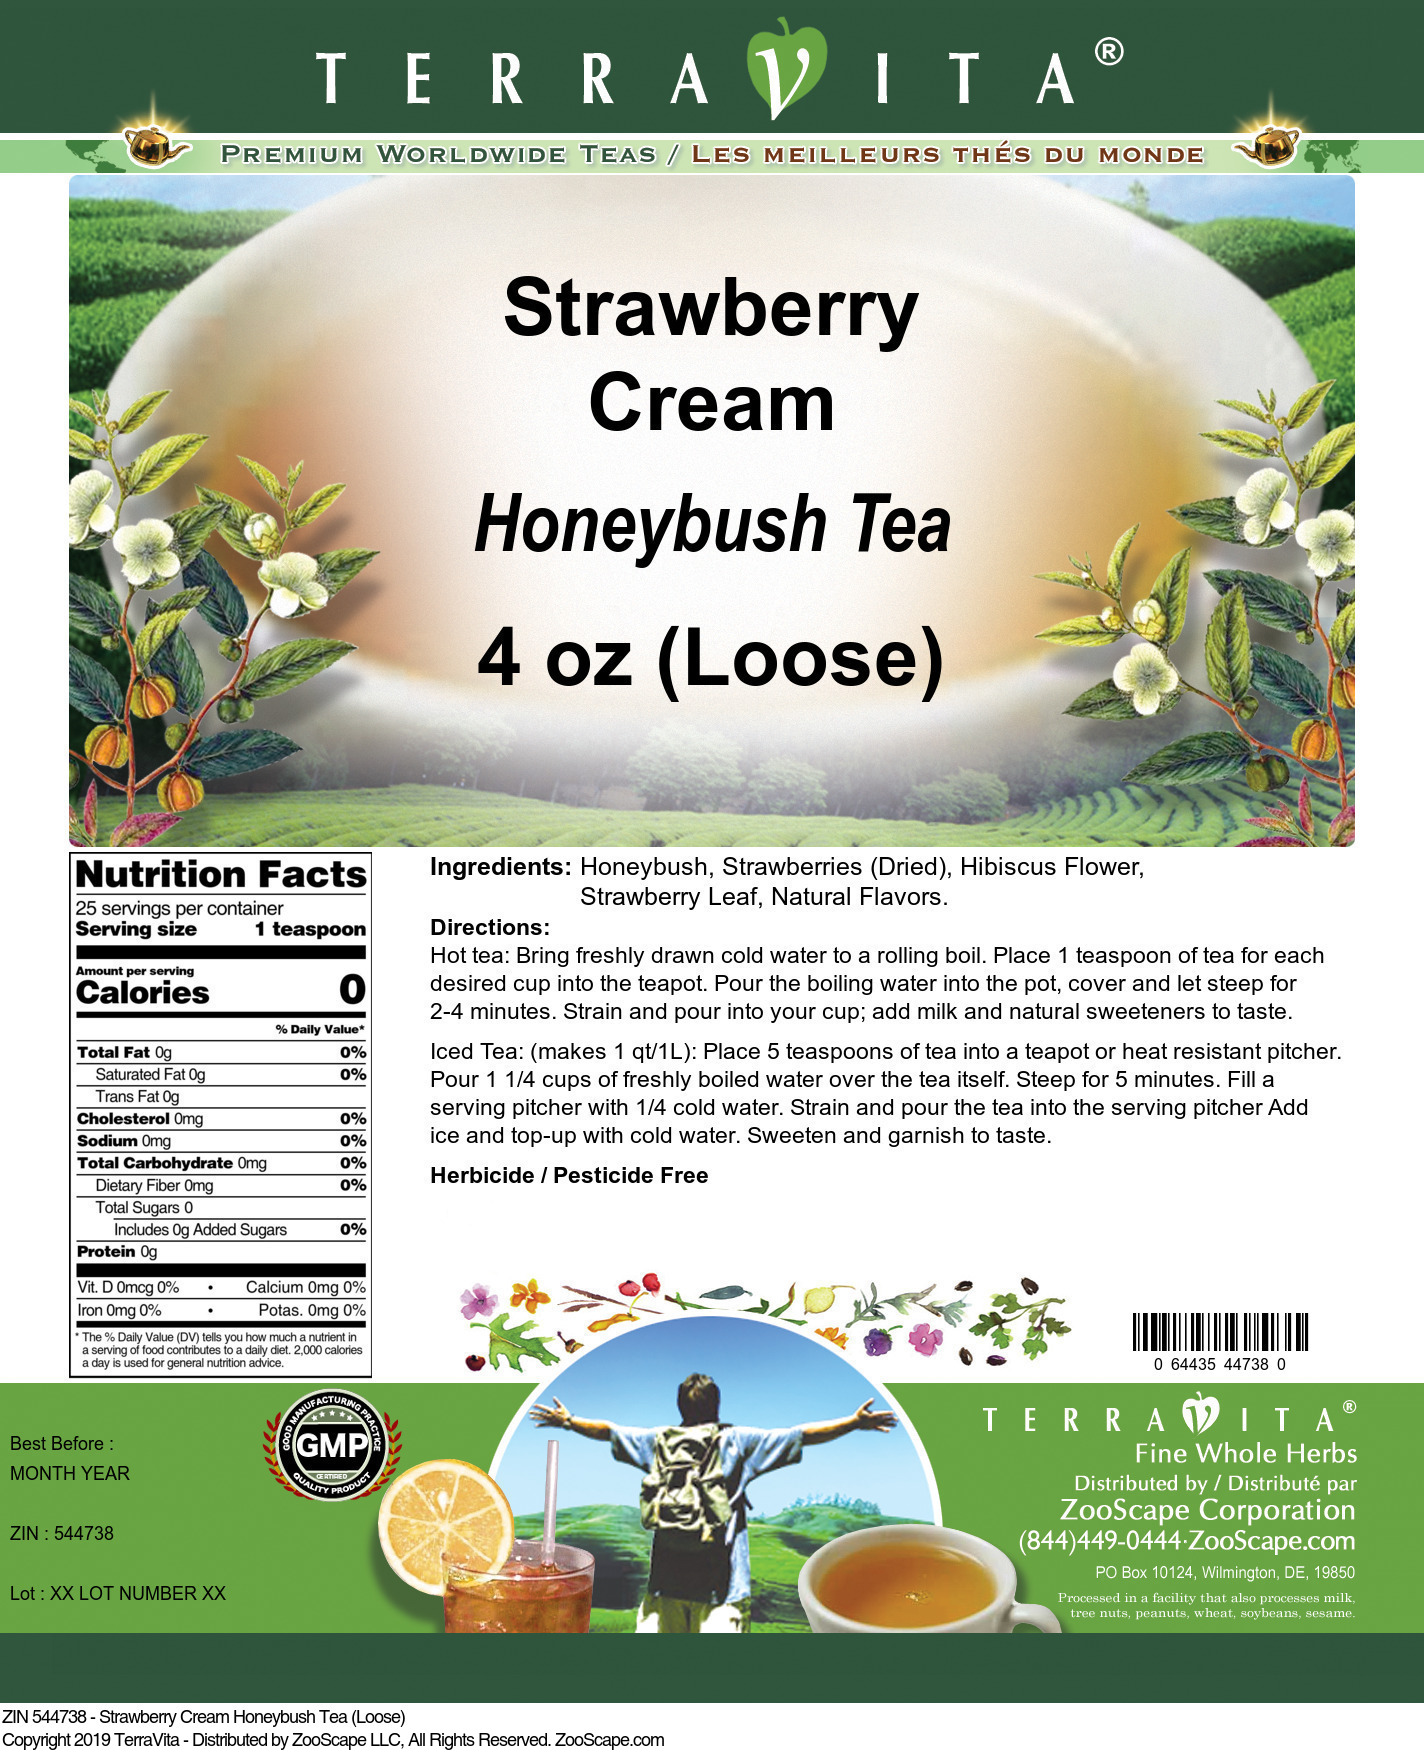 Strawberry Cream Honeybush Tea (Loose)